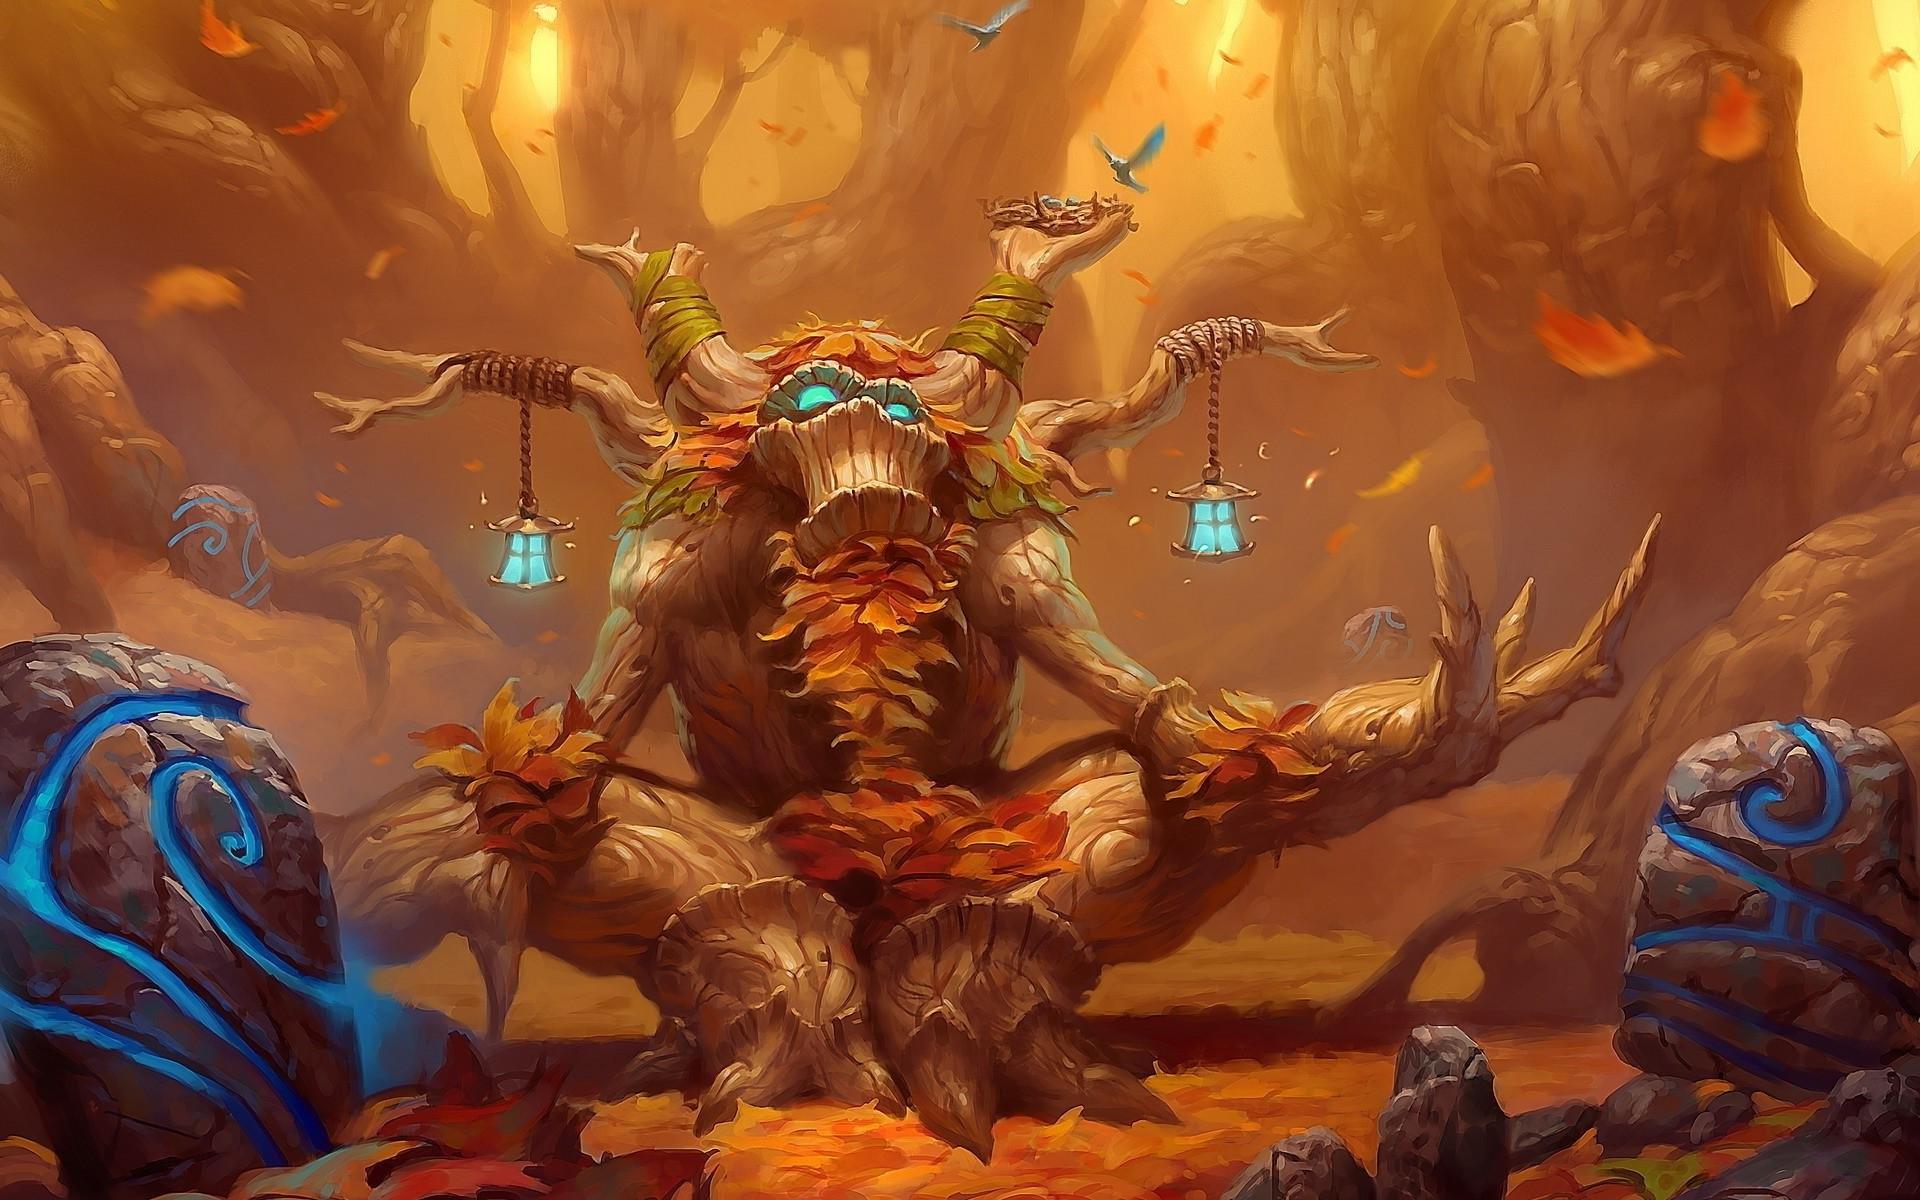 World of Warcraft Wallpaper #20704